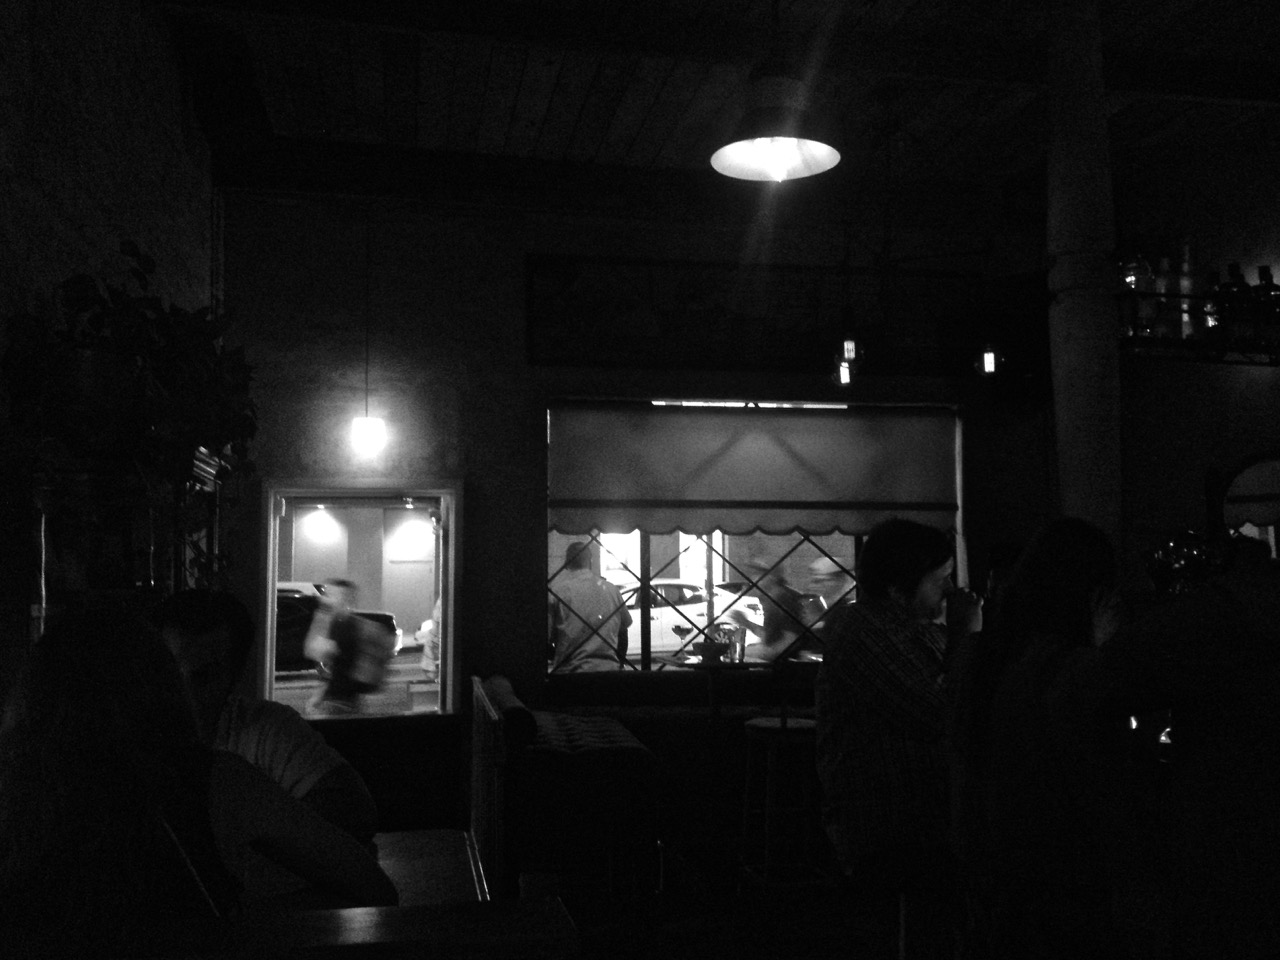 3 Days in L.A. - PowerHouse Legendary Bar (1)